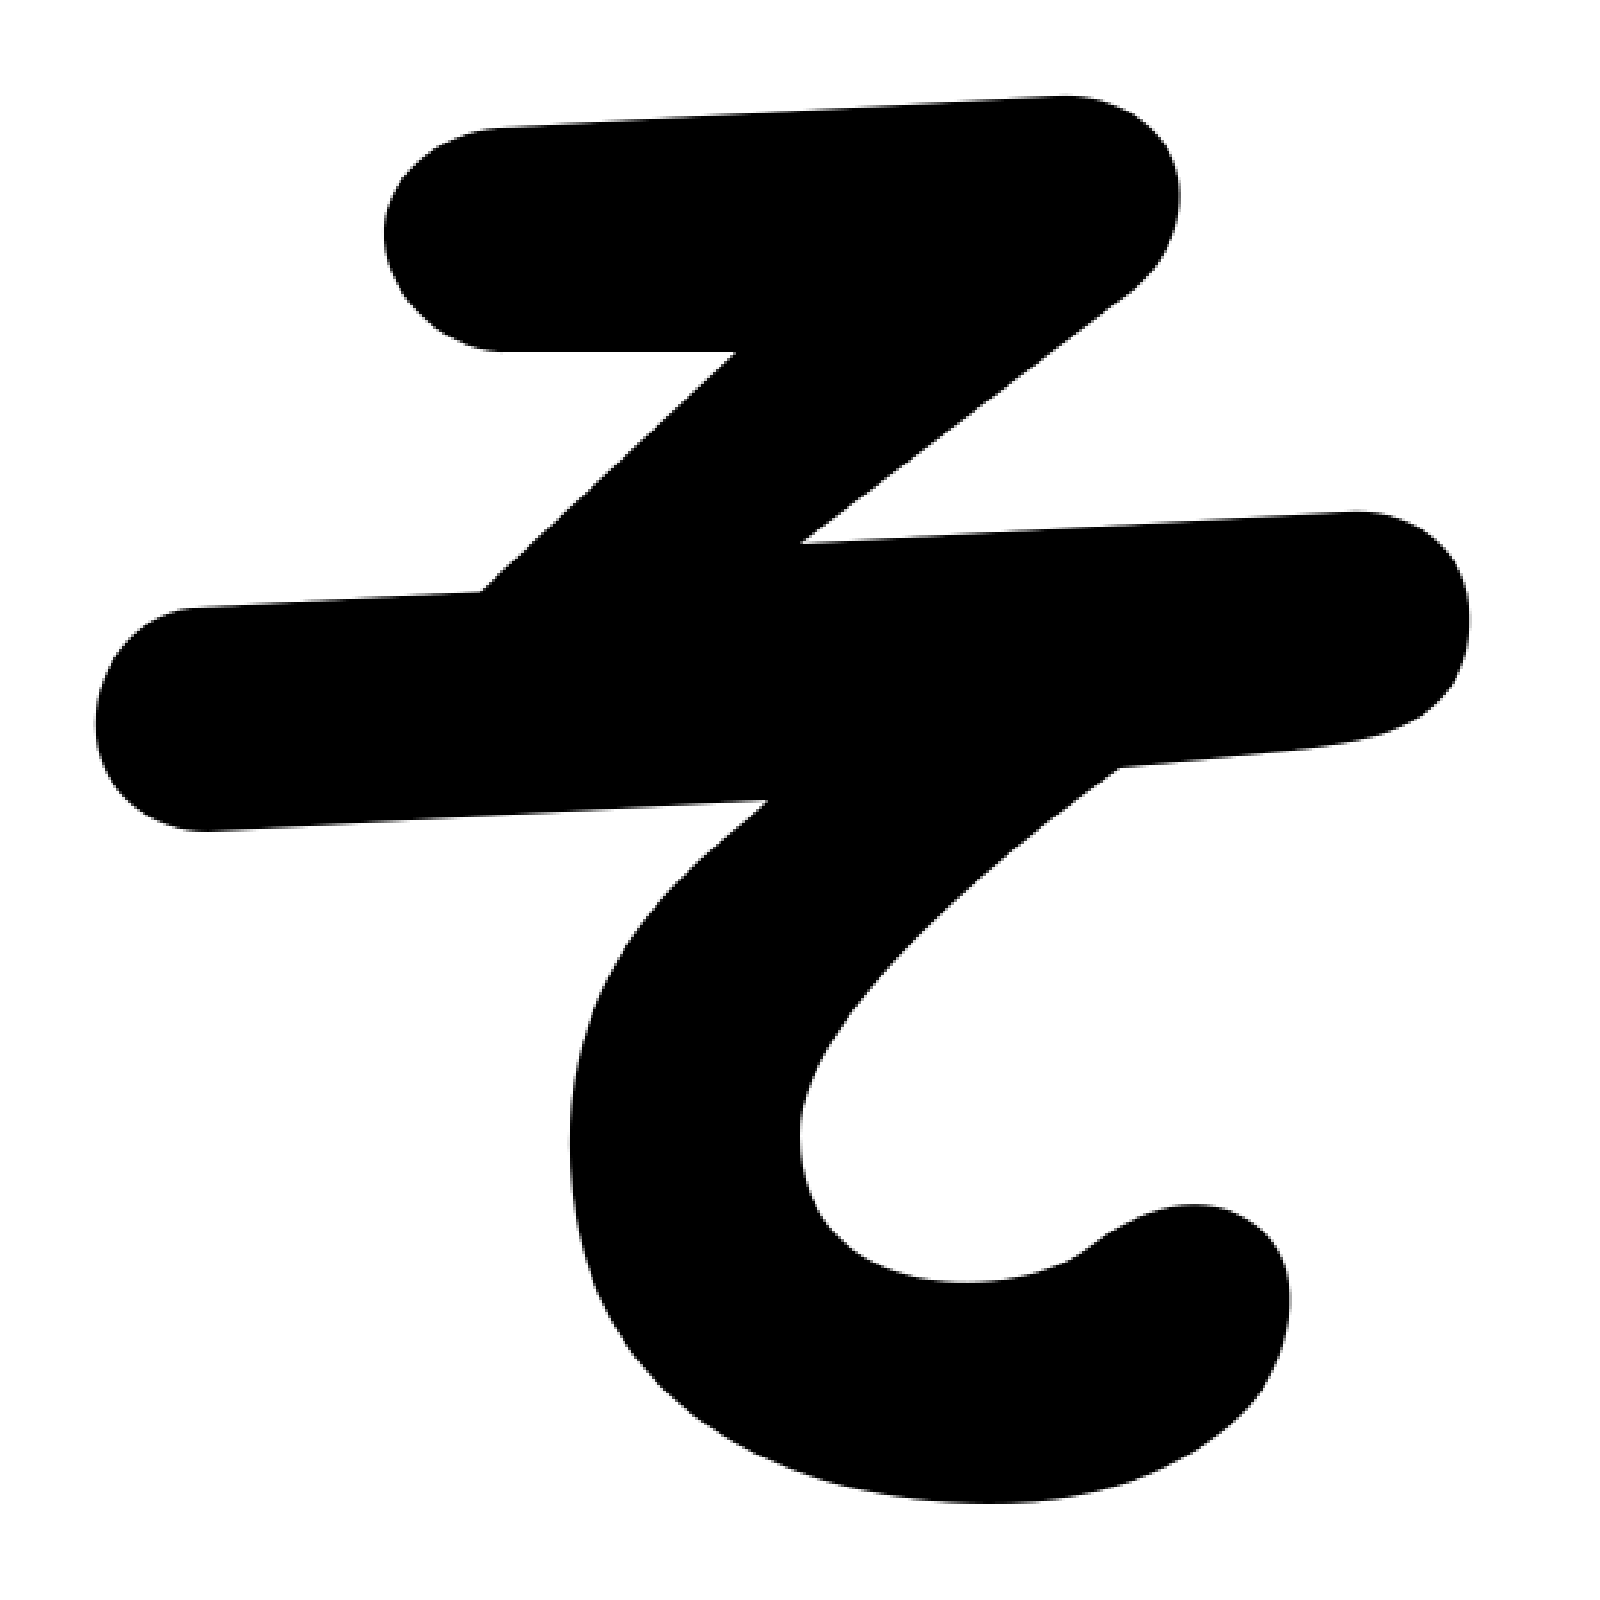 Hiragana So Filled icon